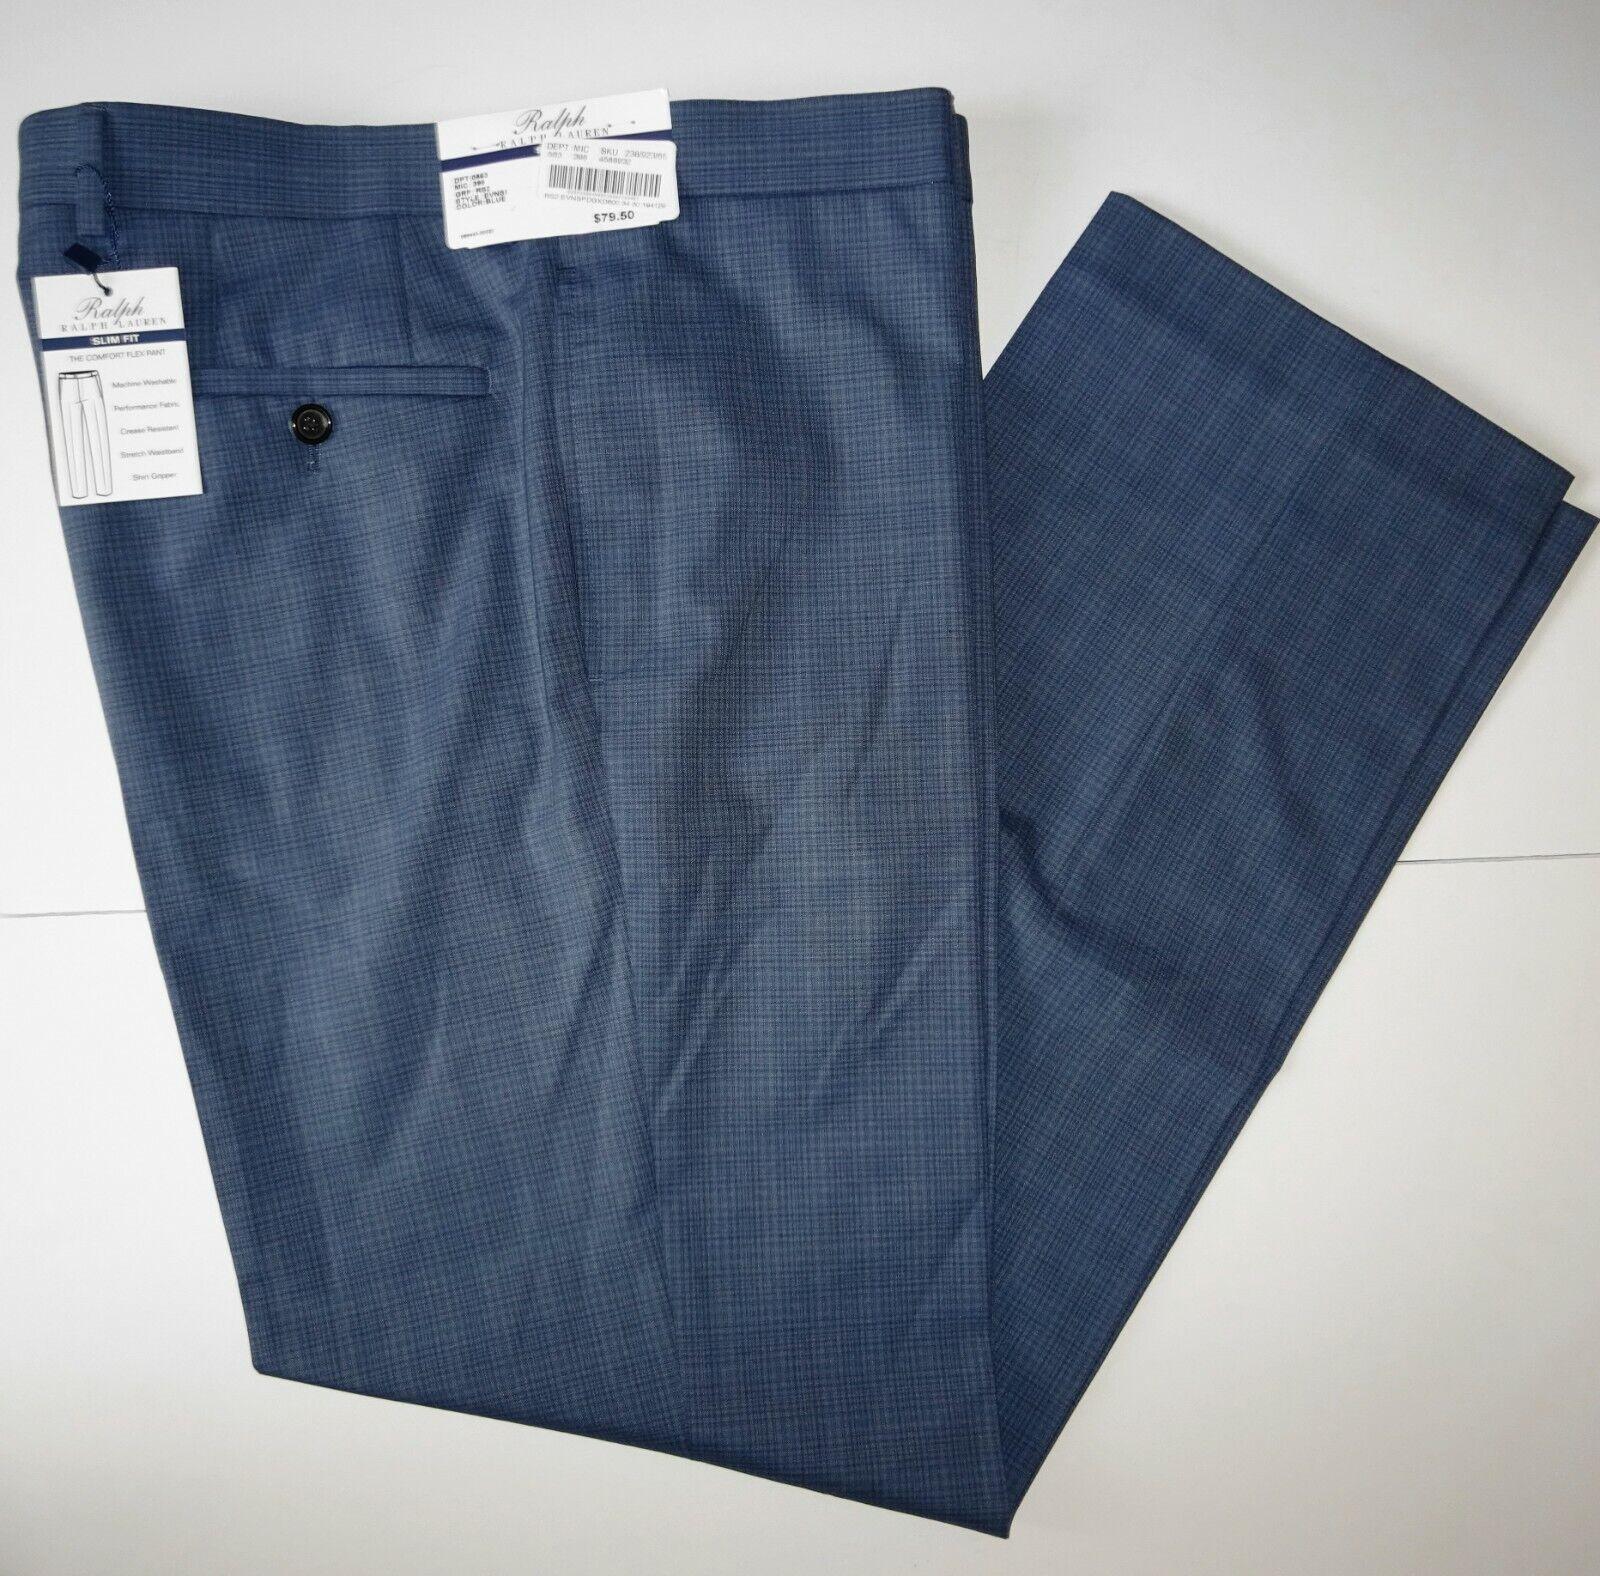 Polo Ralph Lauren Mens Dress Pants 38x30 Blue Slim Fit Mini